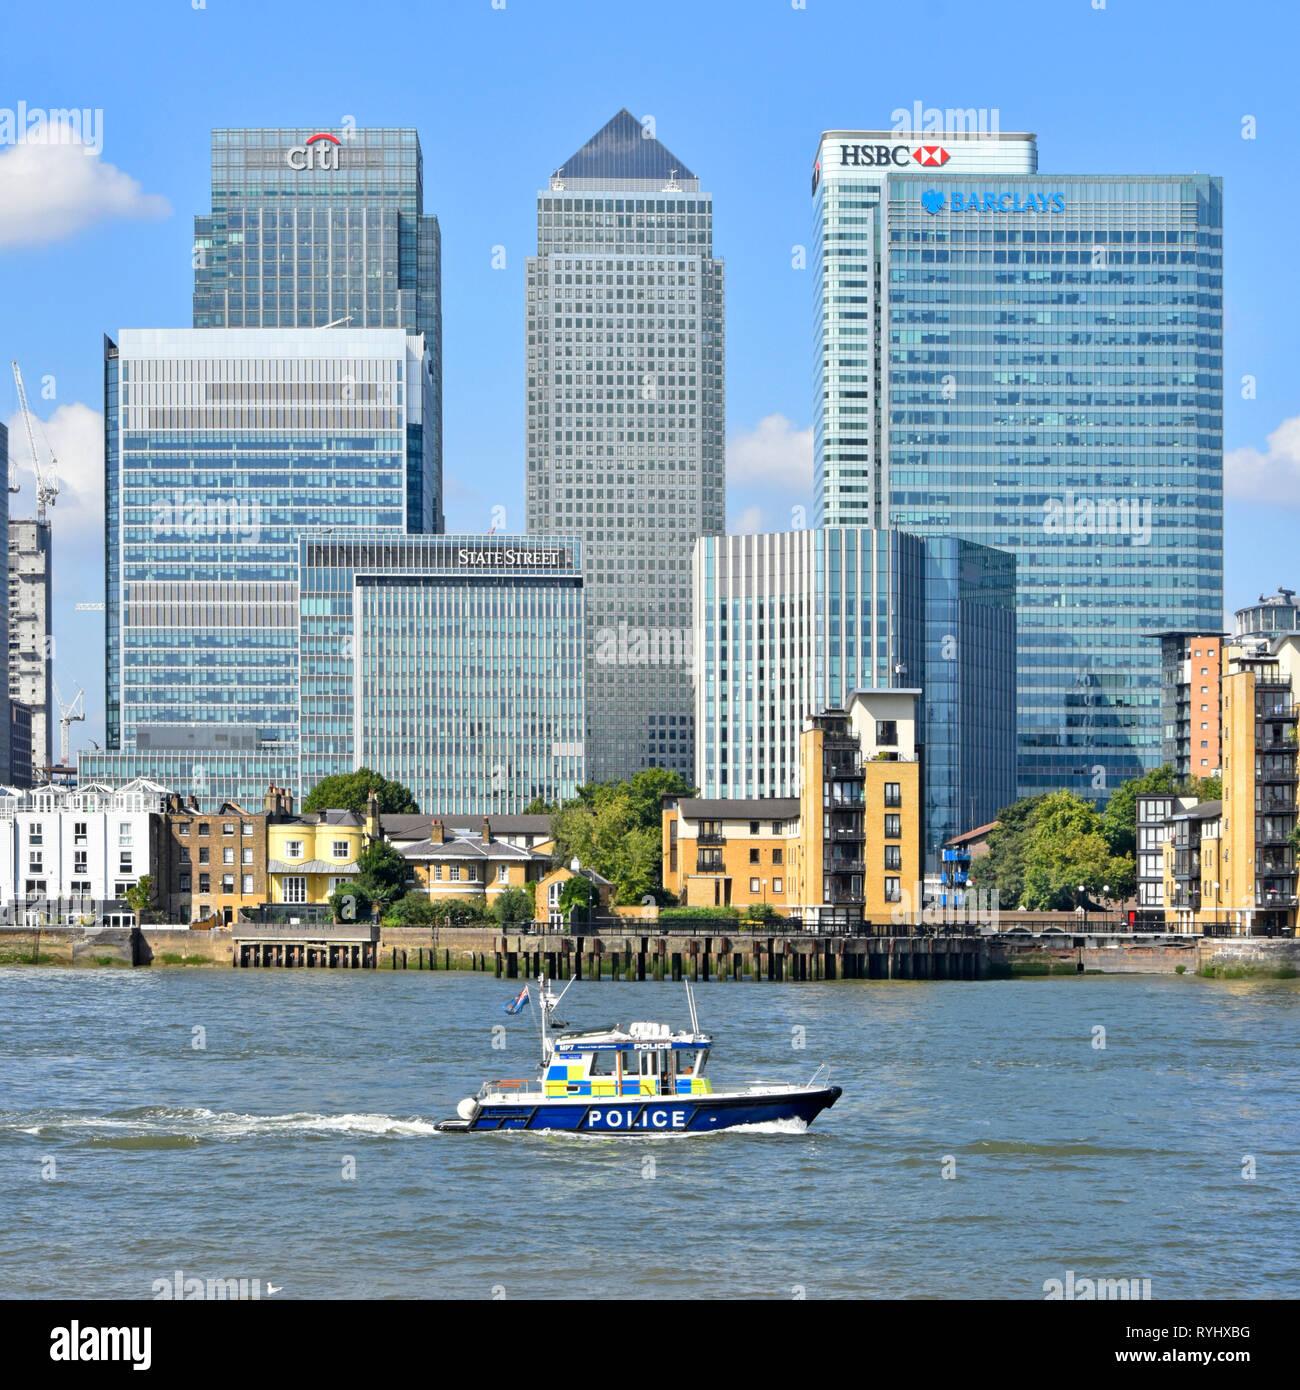 Metropolitan police River Thames patrol passing modern landmark skyscraper building on Canary Wharf Isle of Dogs London Docklands skyline  England UK - Stock Image